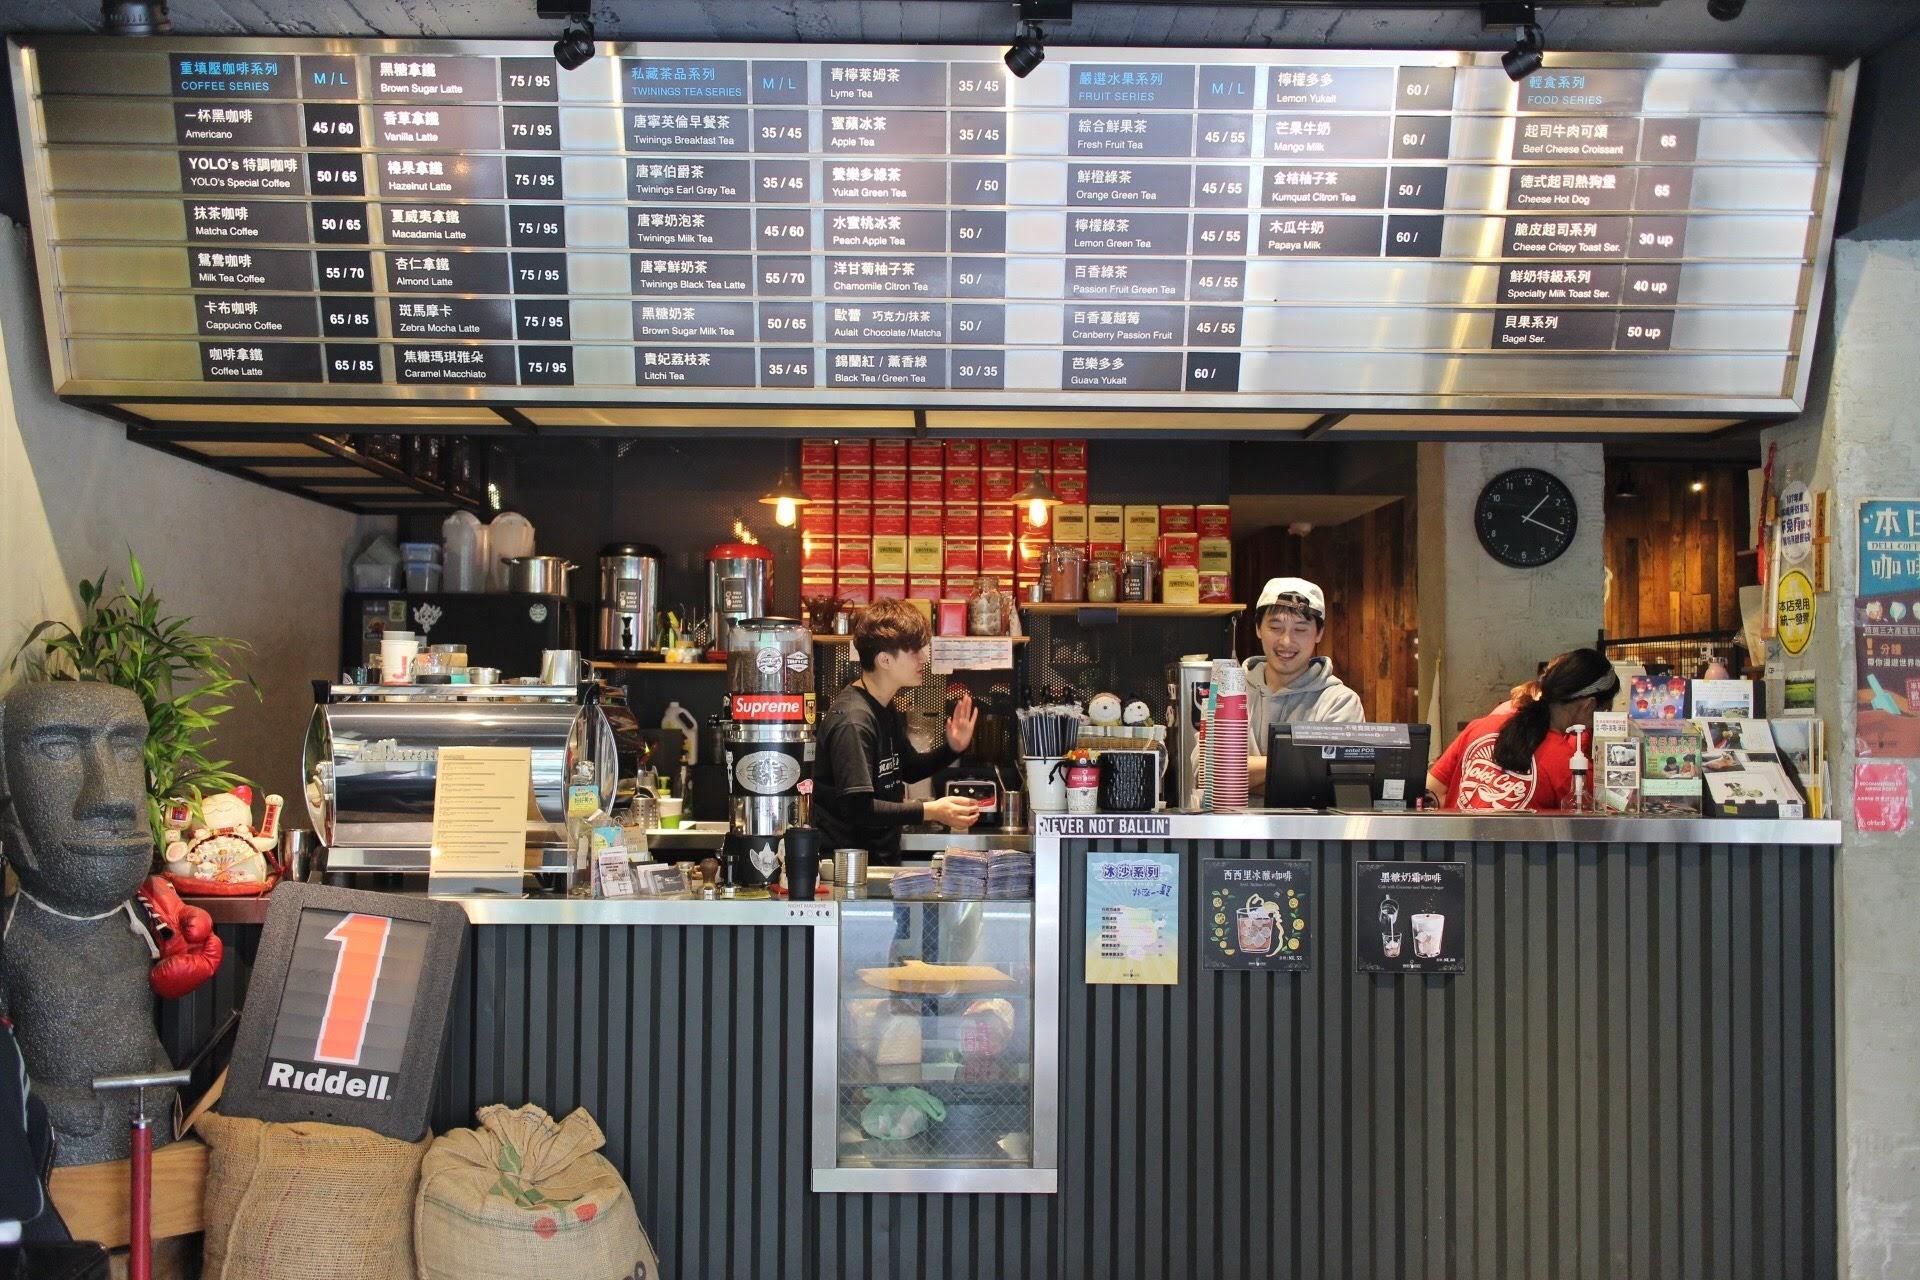 Yolo's Cafe 通安總店